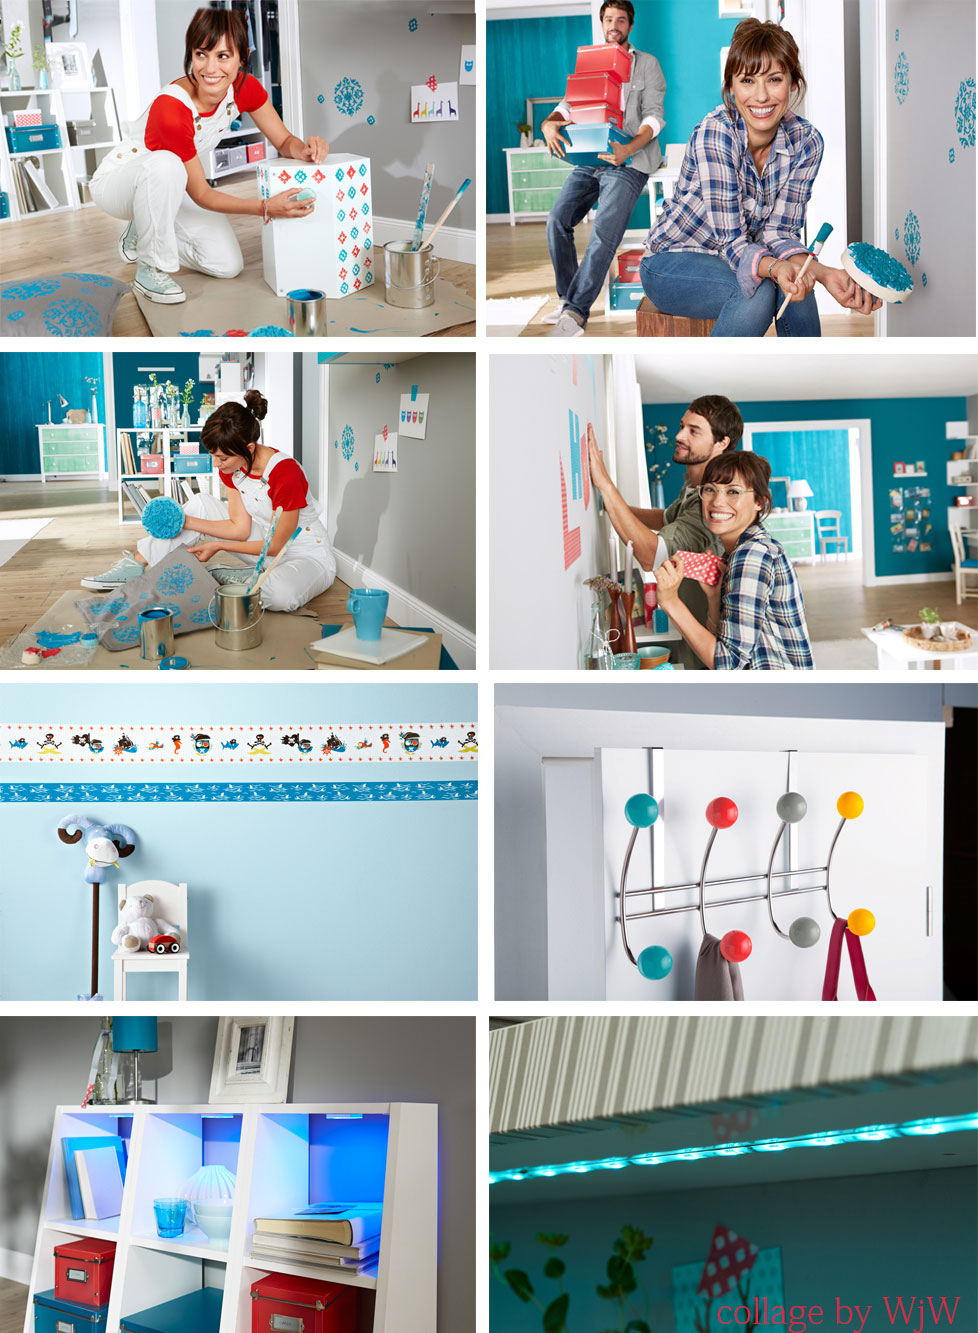 dekoracja ścian i mebli - DIY